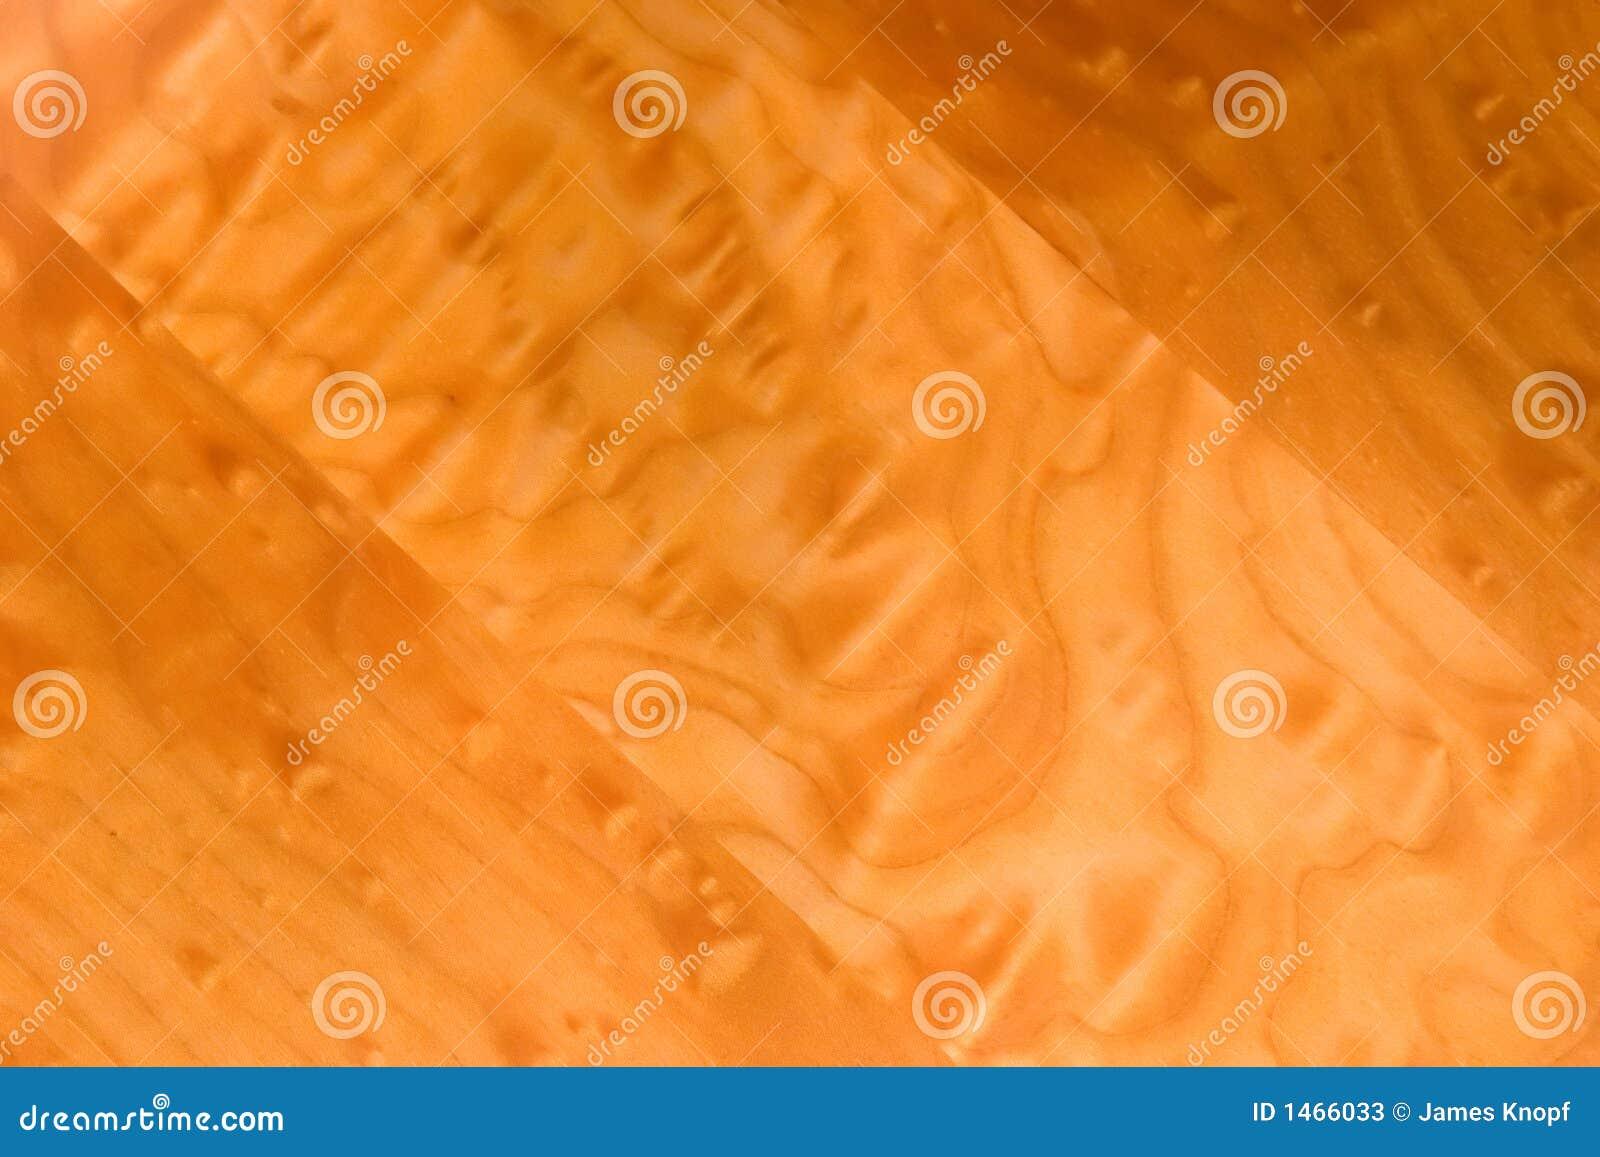 древесина тигра клена стула предпосылки тряся